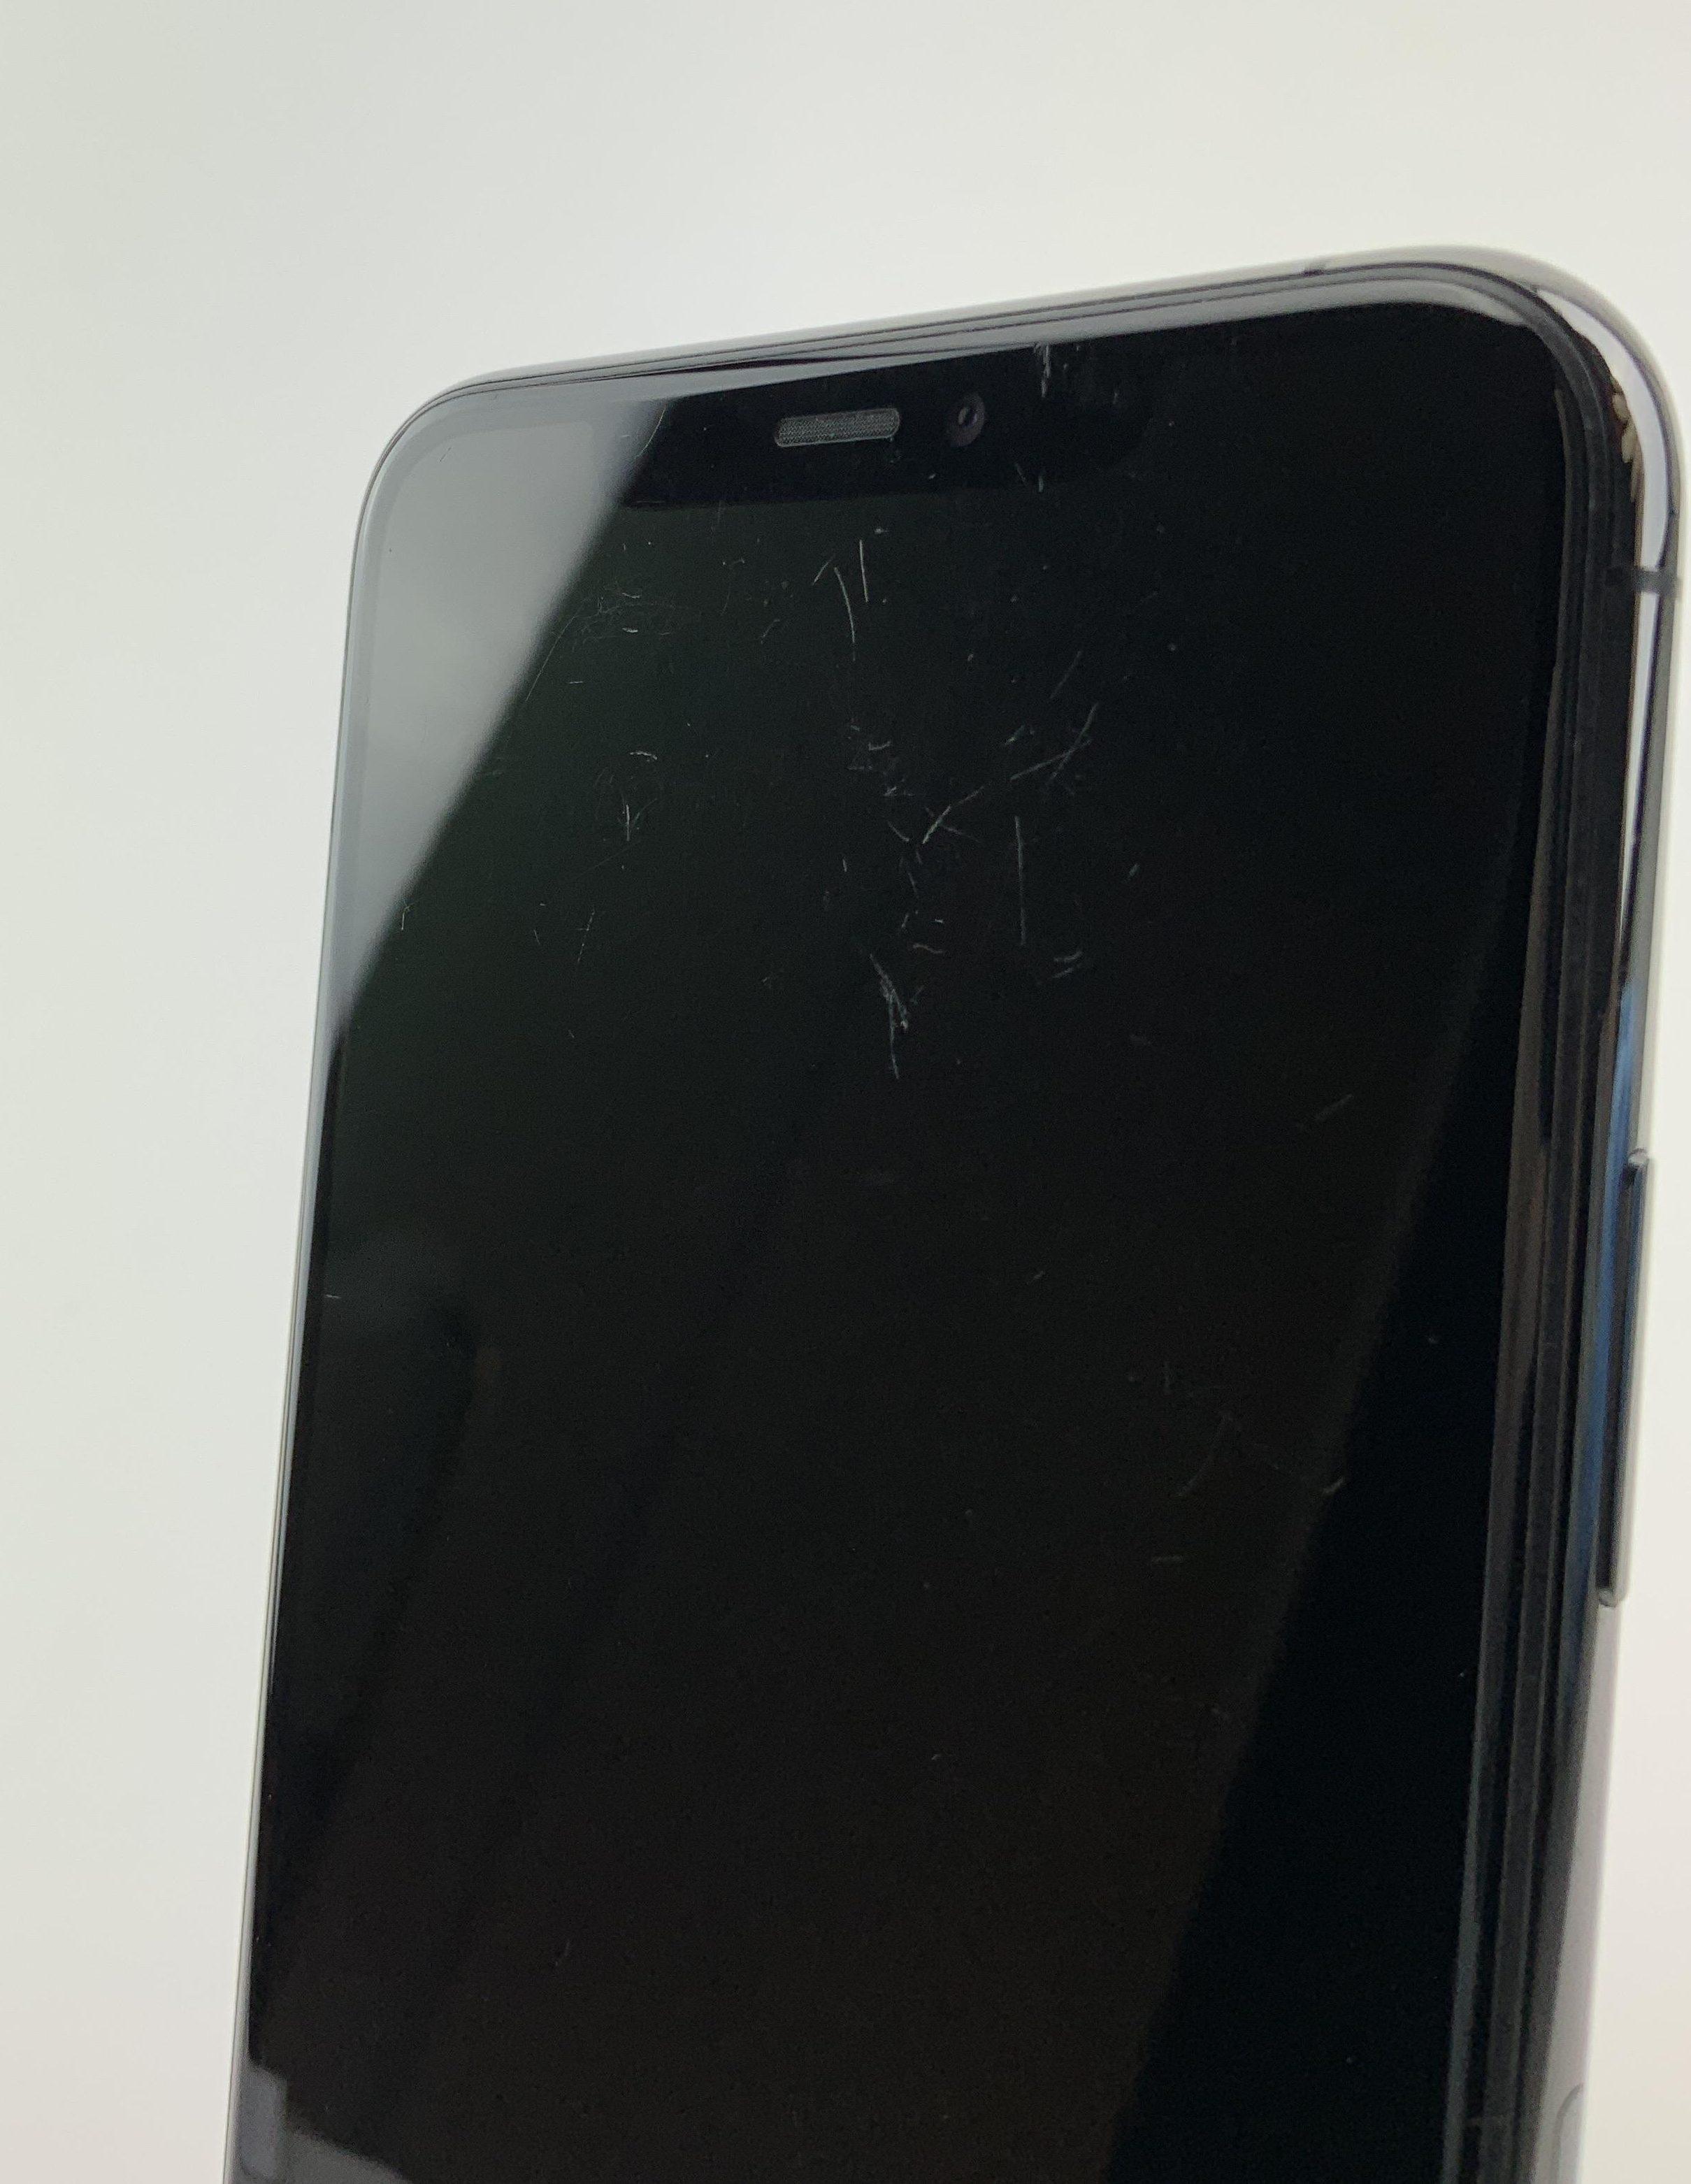 iPhone 11 Pro Max 512GB, 512GB, Space Gray, bild 3